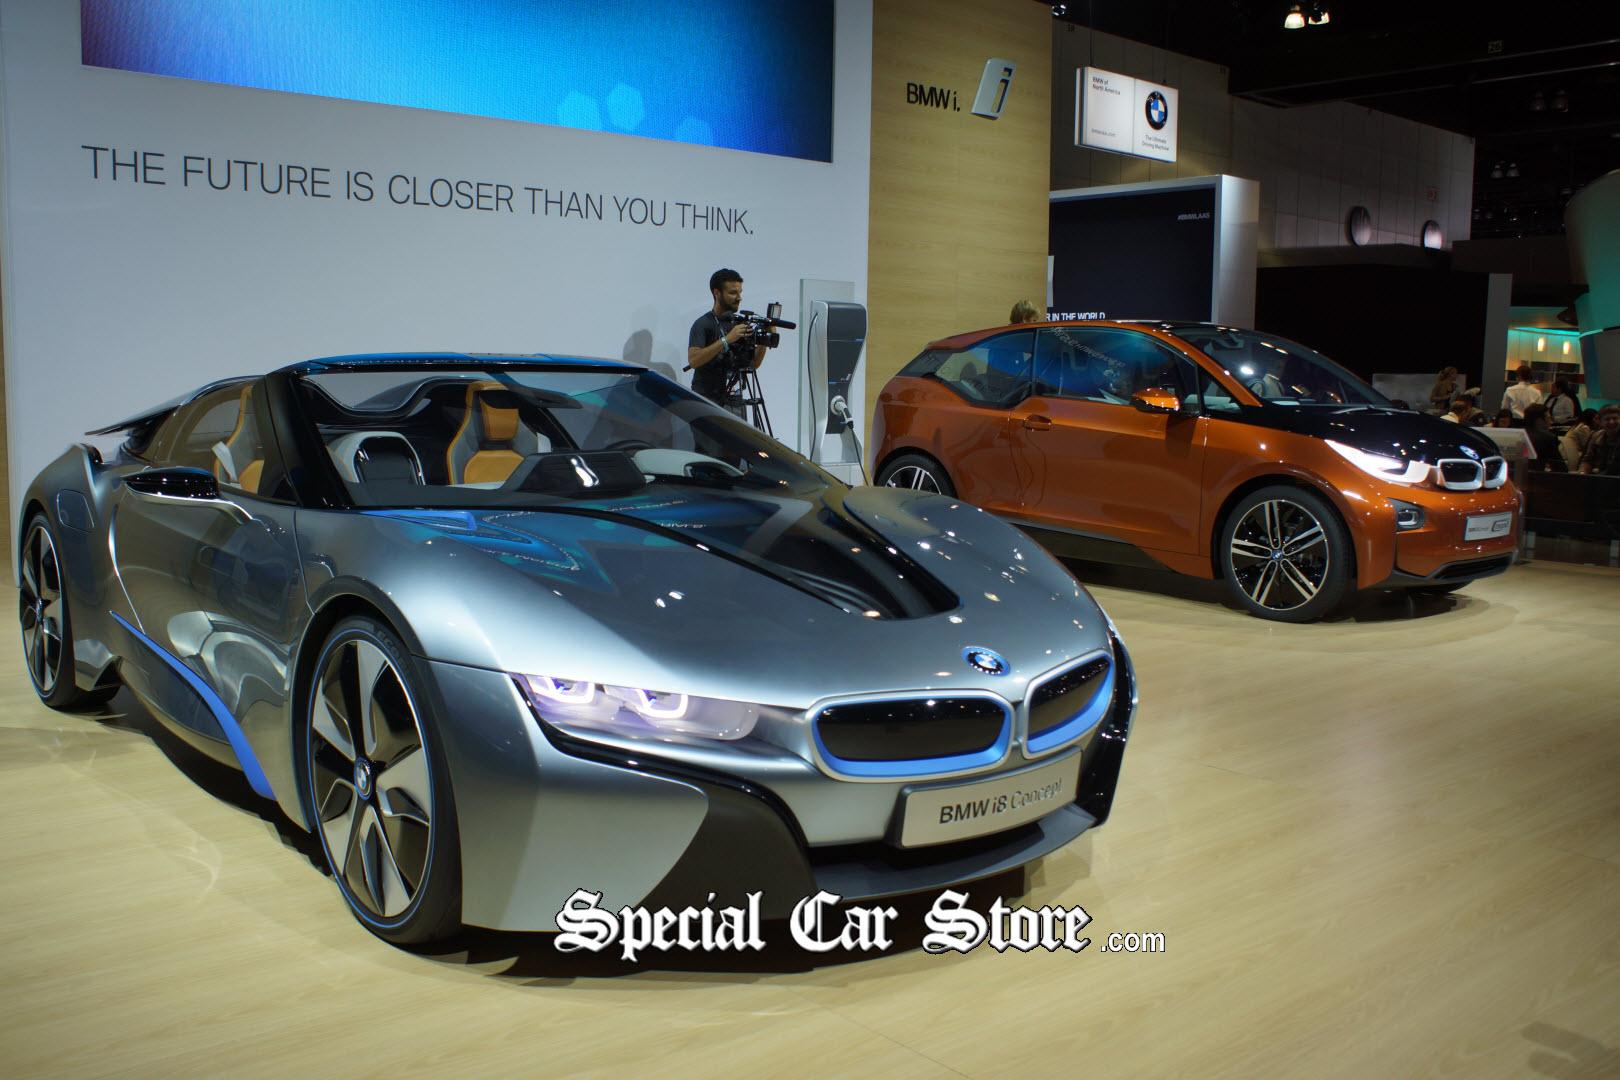 bmw 2012 la auto show | special car store